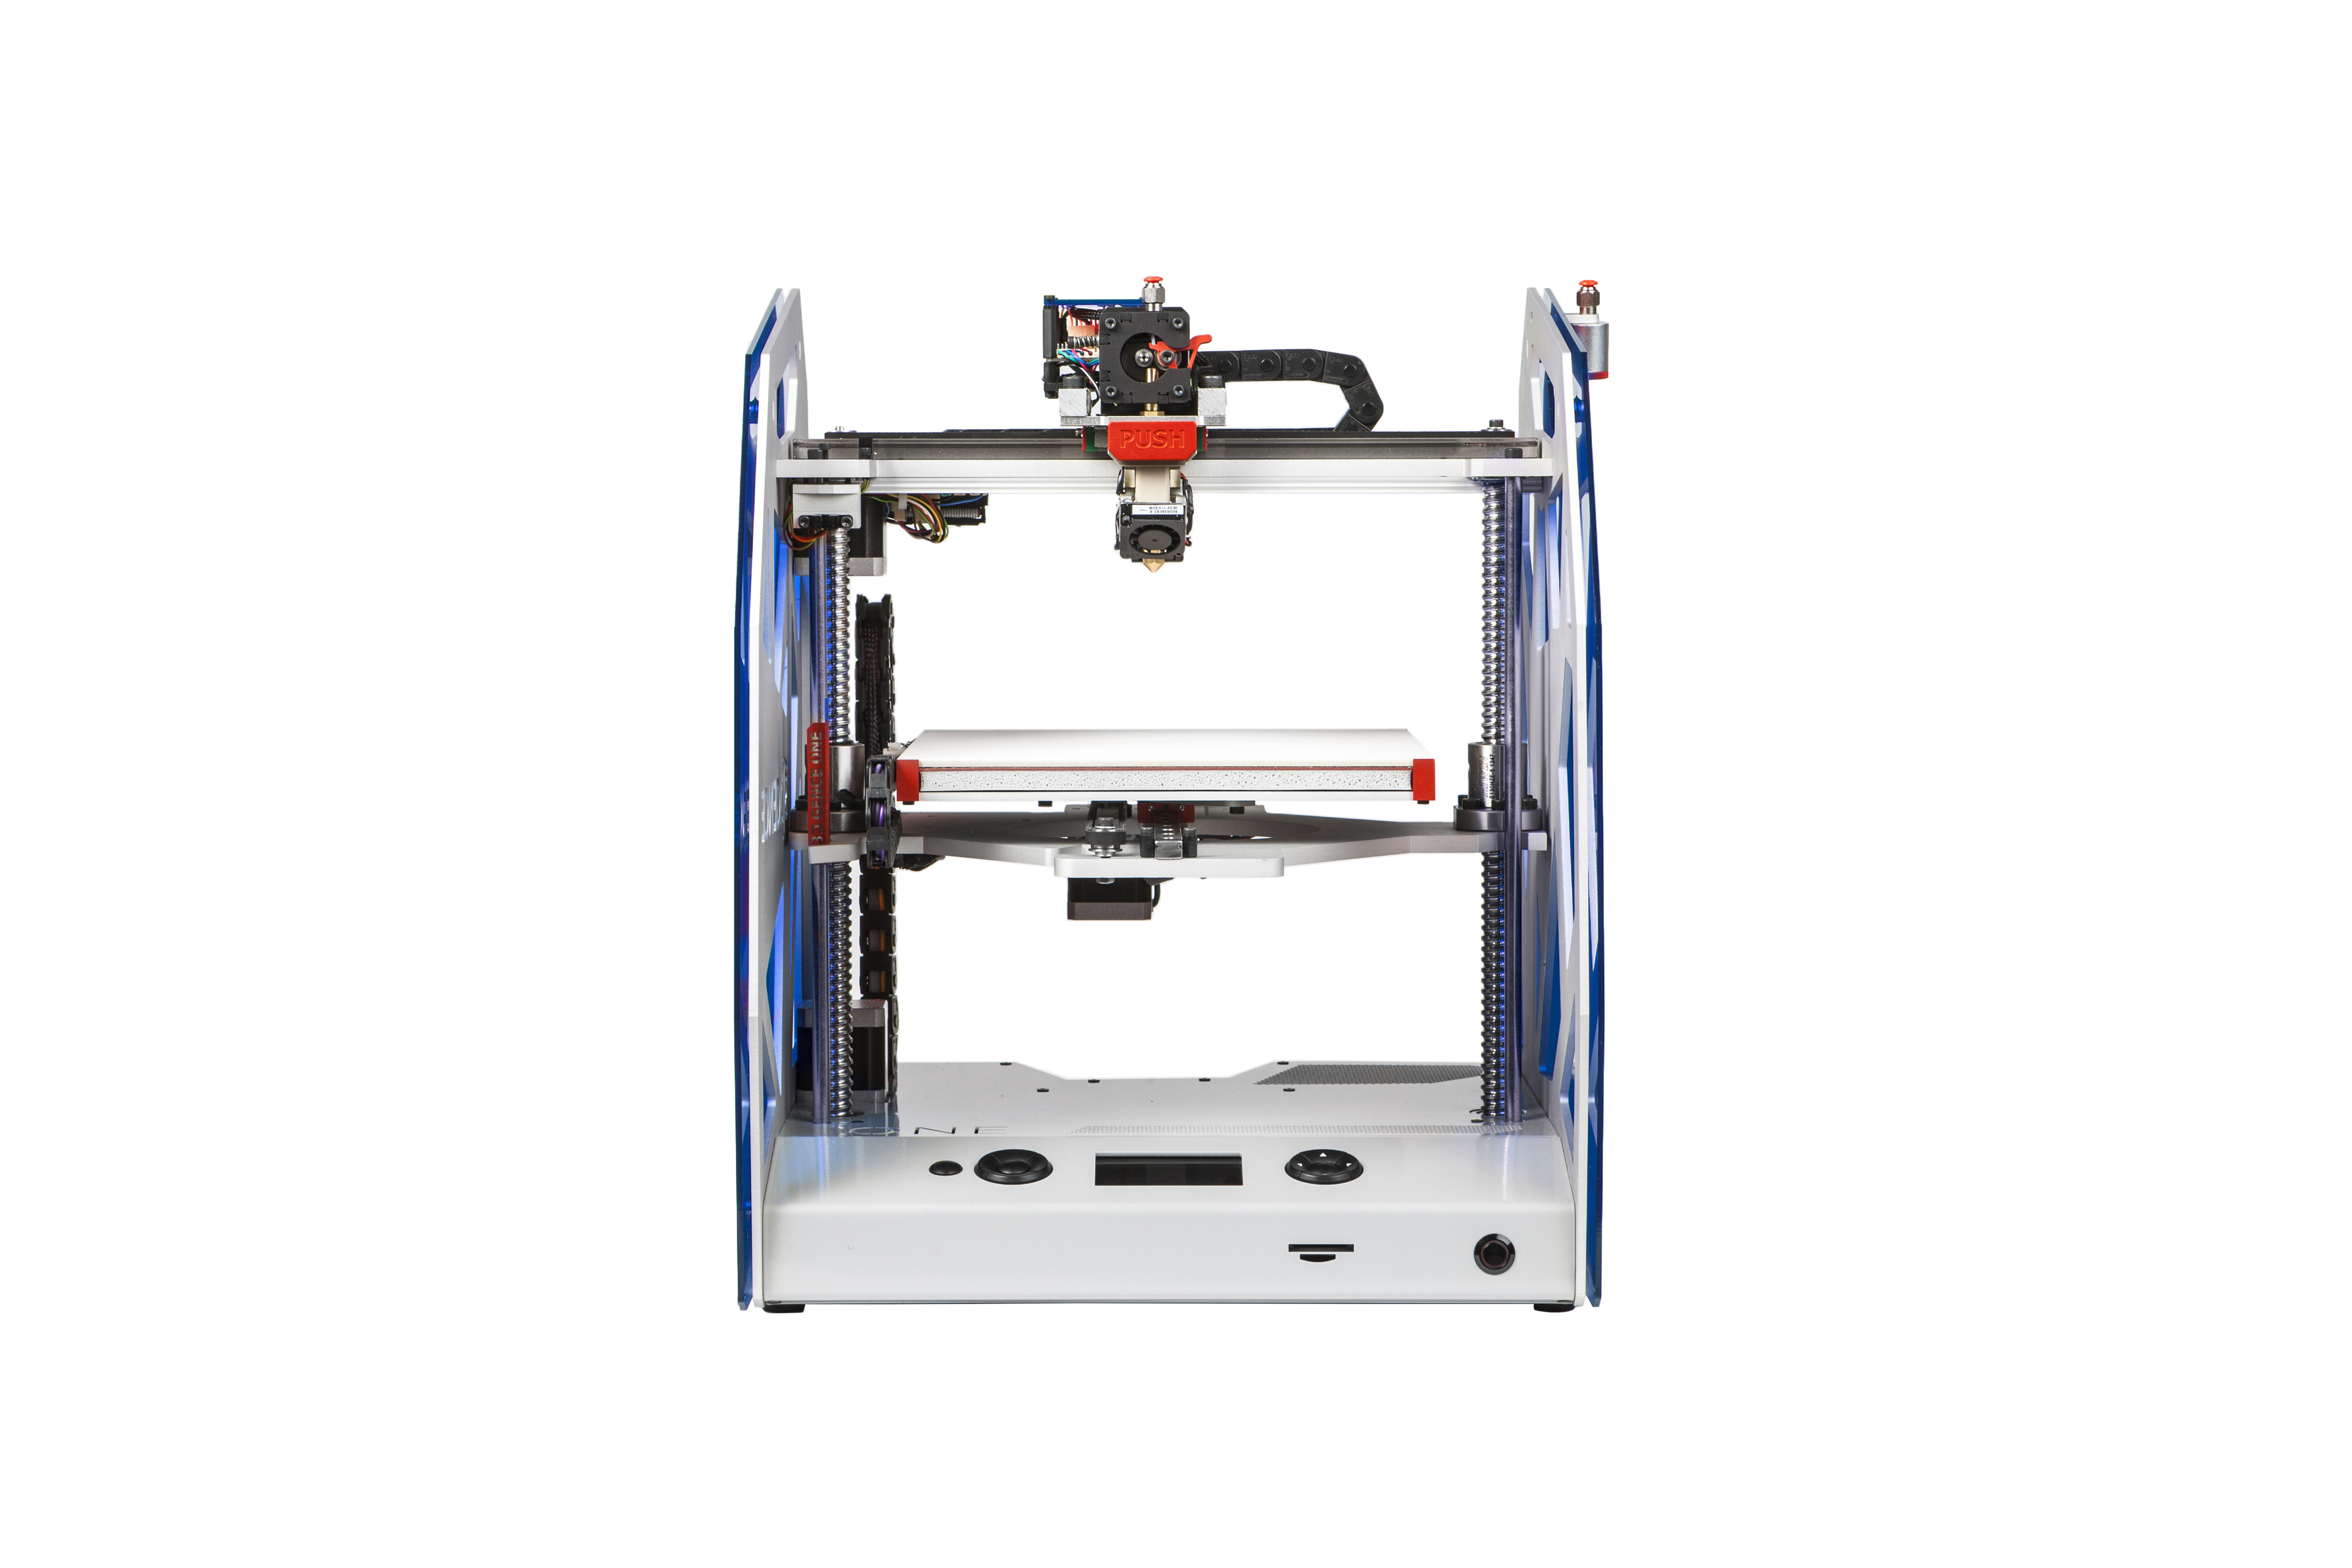 3DGence_One_3d_printer1